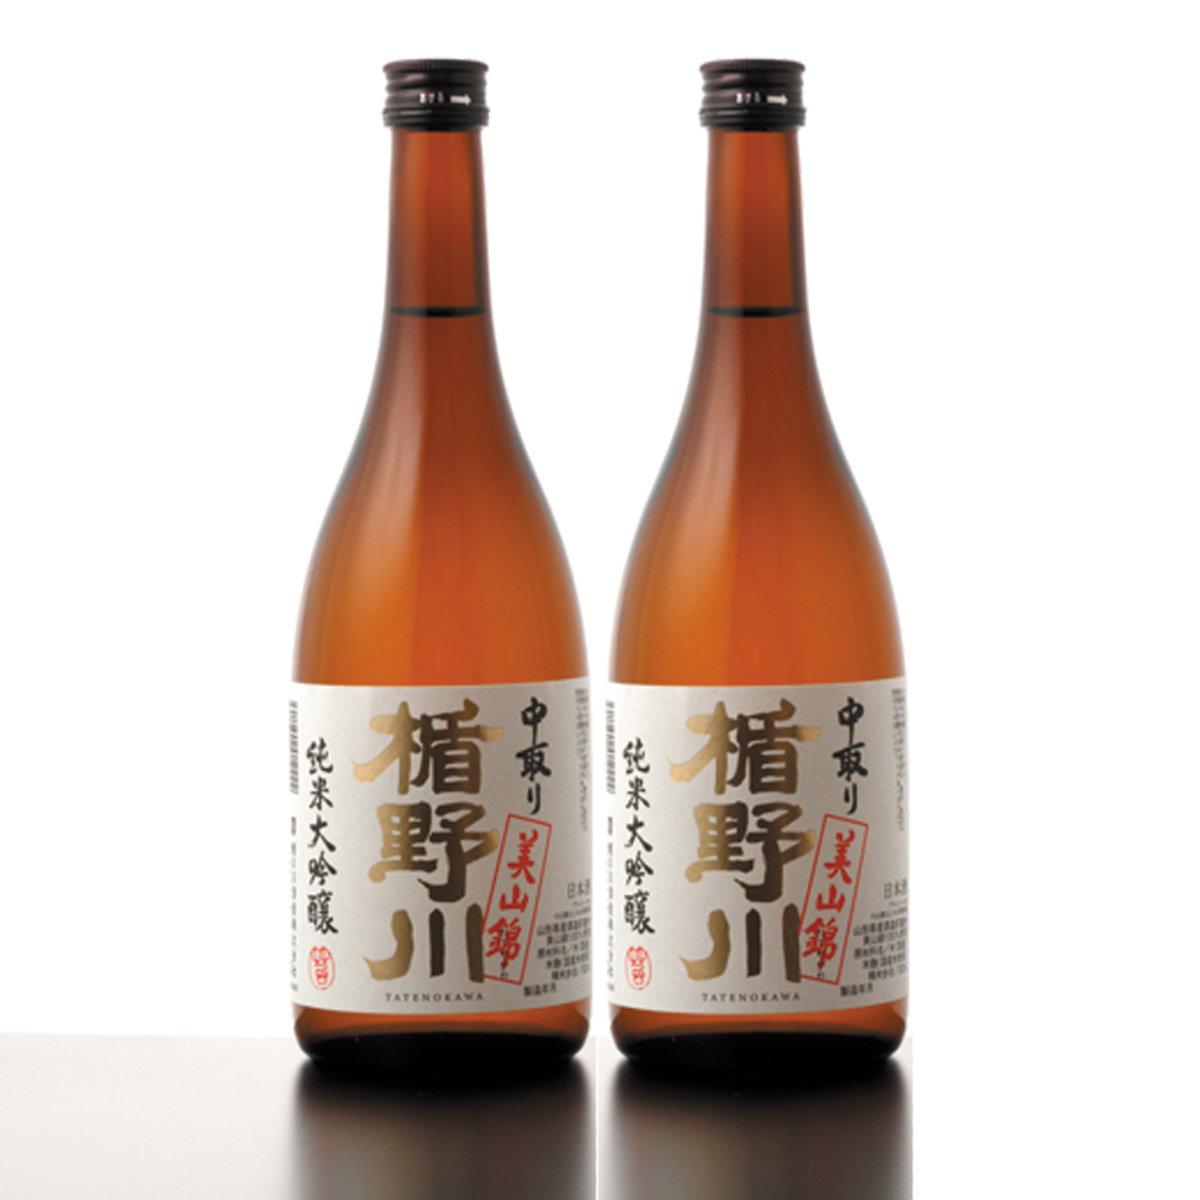 Tatenokawa Nakadori Junmai Daiginjyo Combo 2